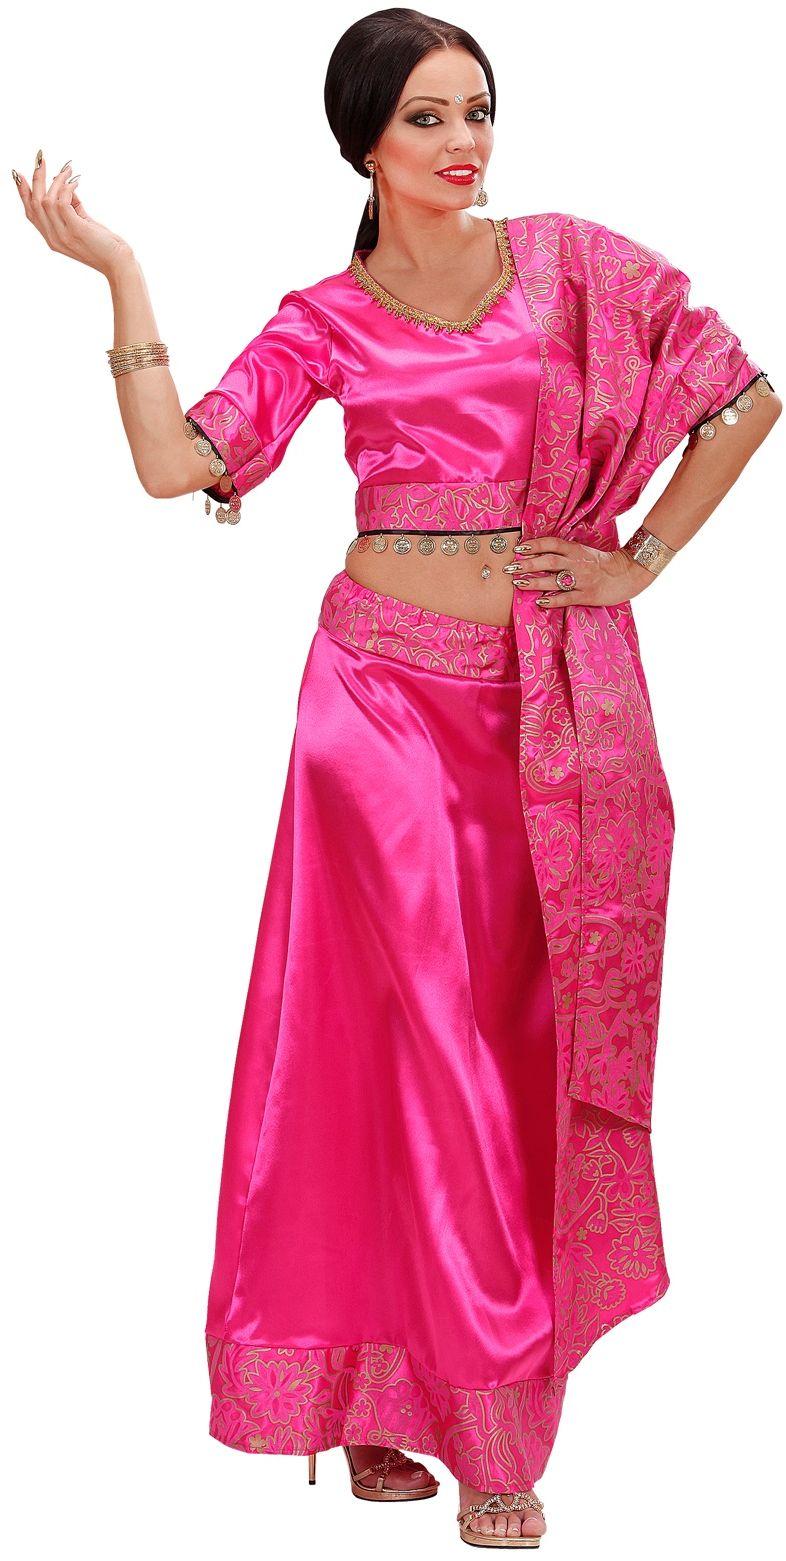 Roze buikdanseres kostuum